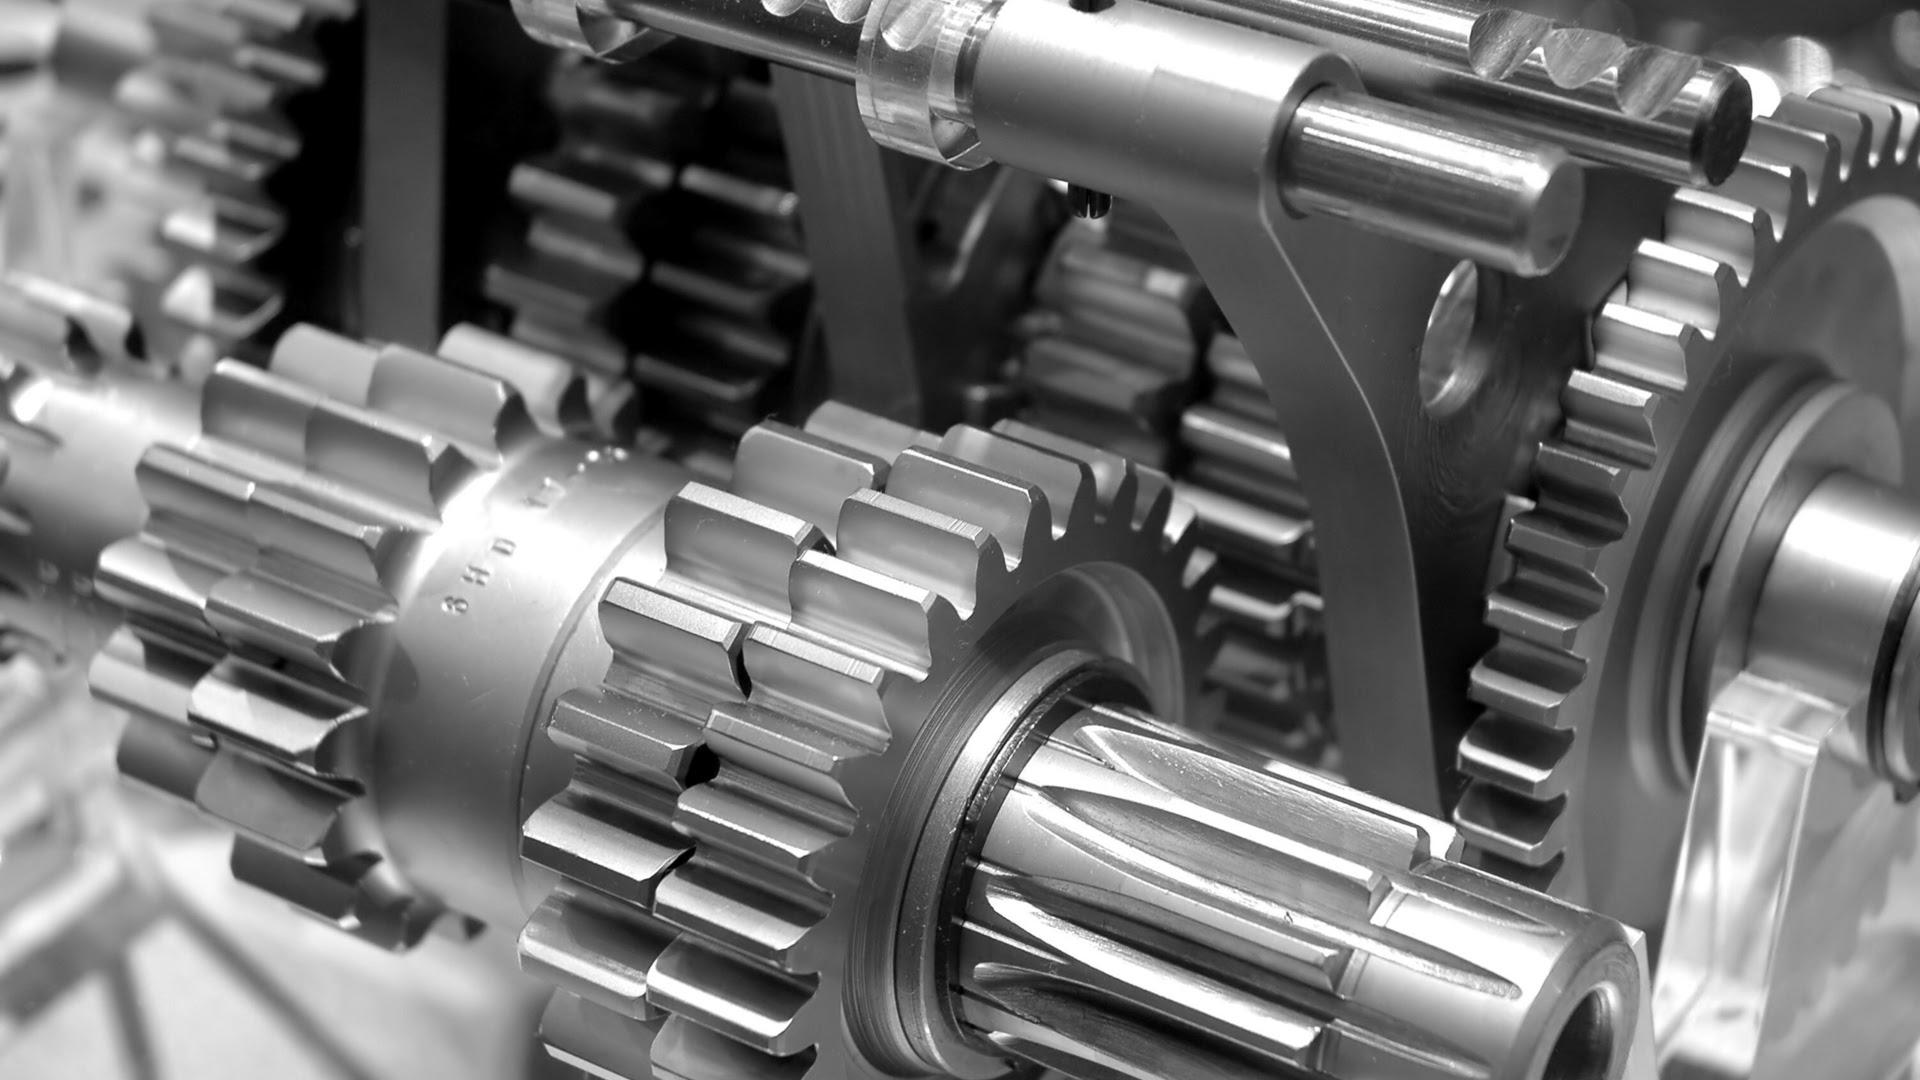 Mechanical Engineering Wallpapers HD - WallpaperSafari